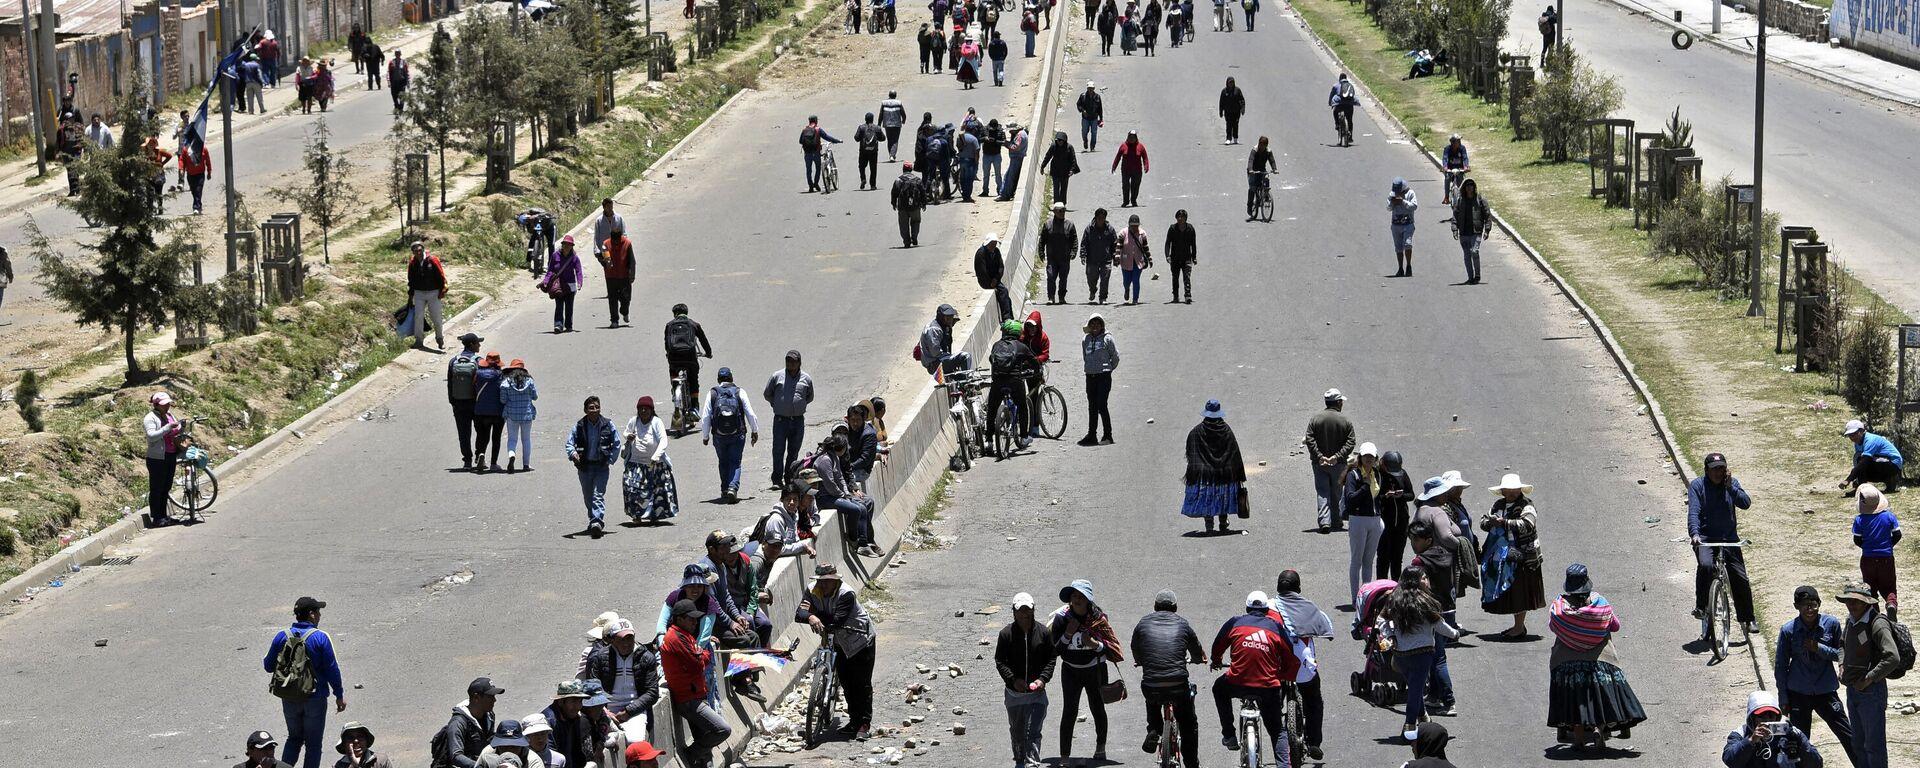 Protestas en El Alto, Bolivia - Sputnik Mundo, 1920, 20.07.2021